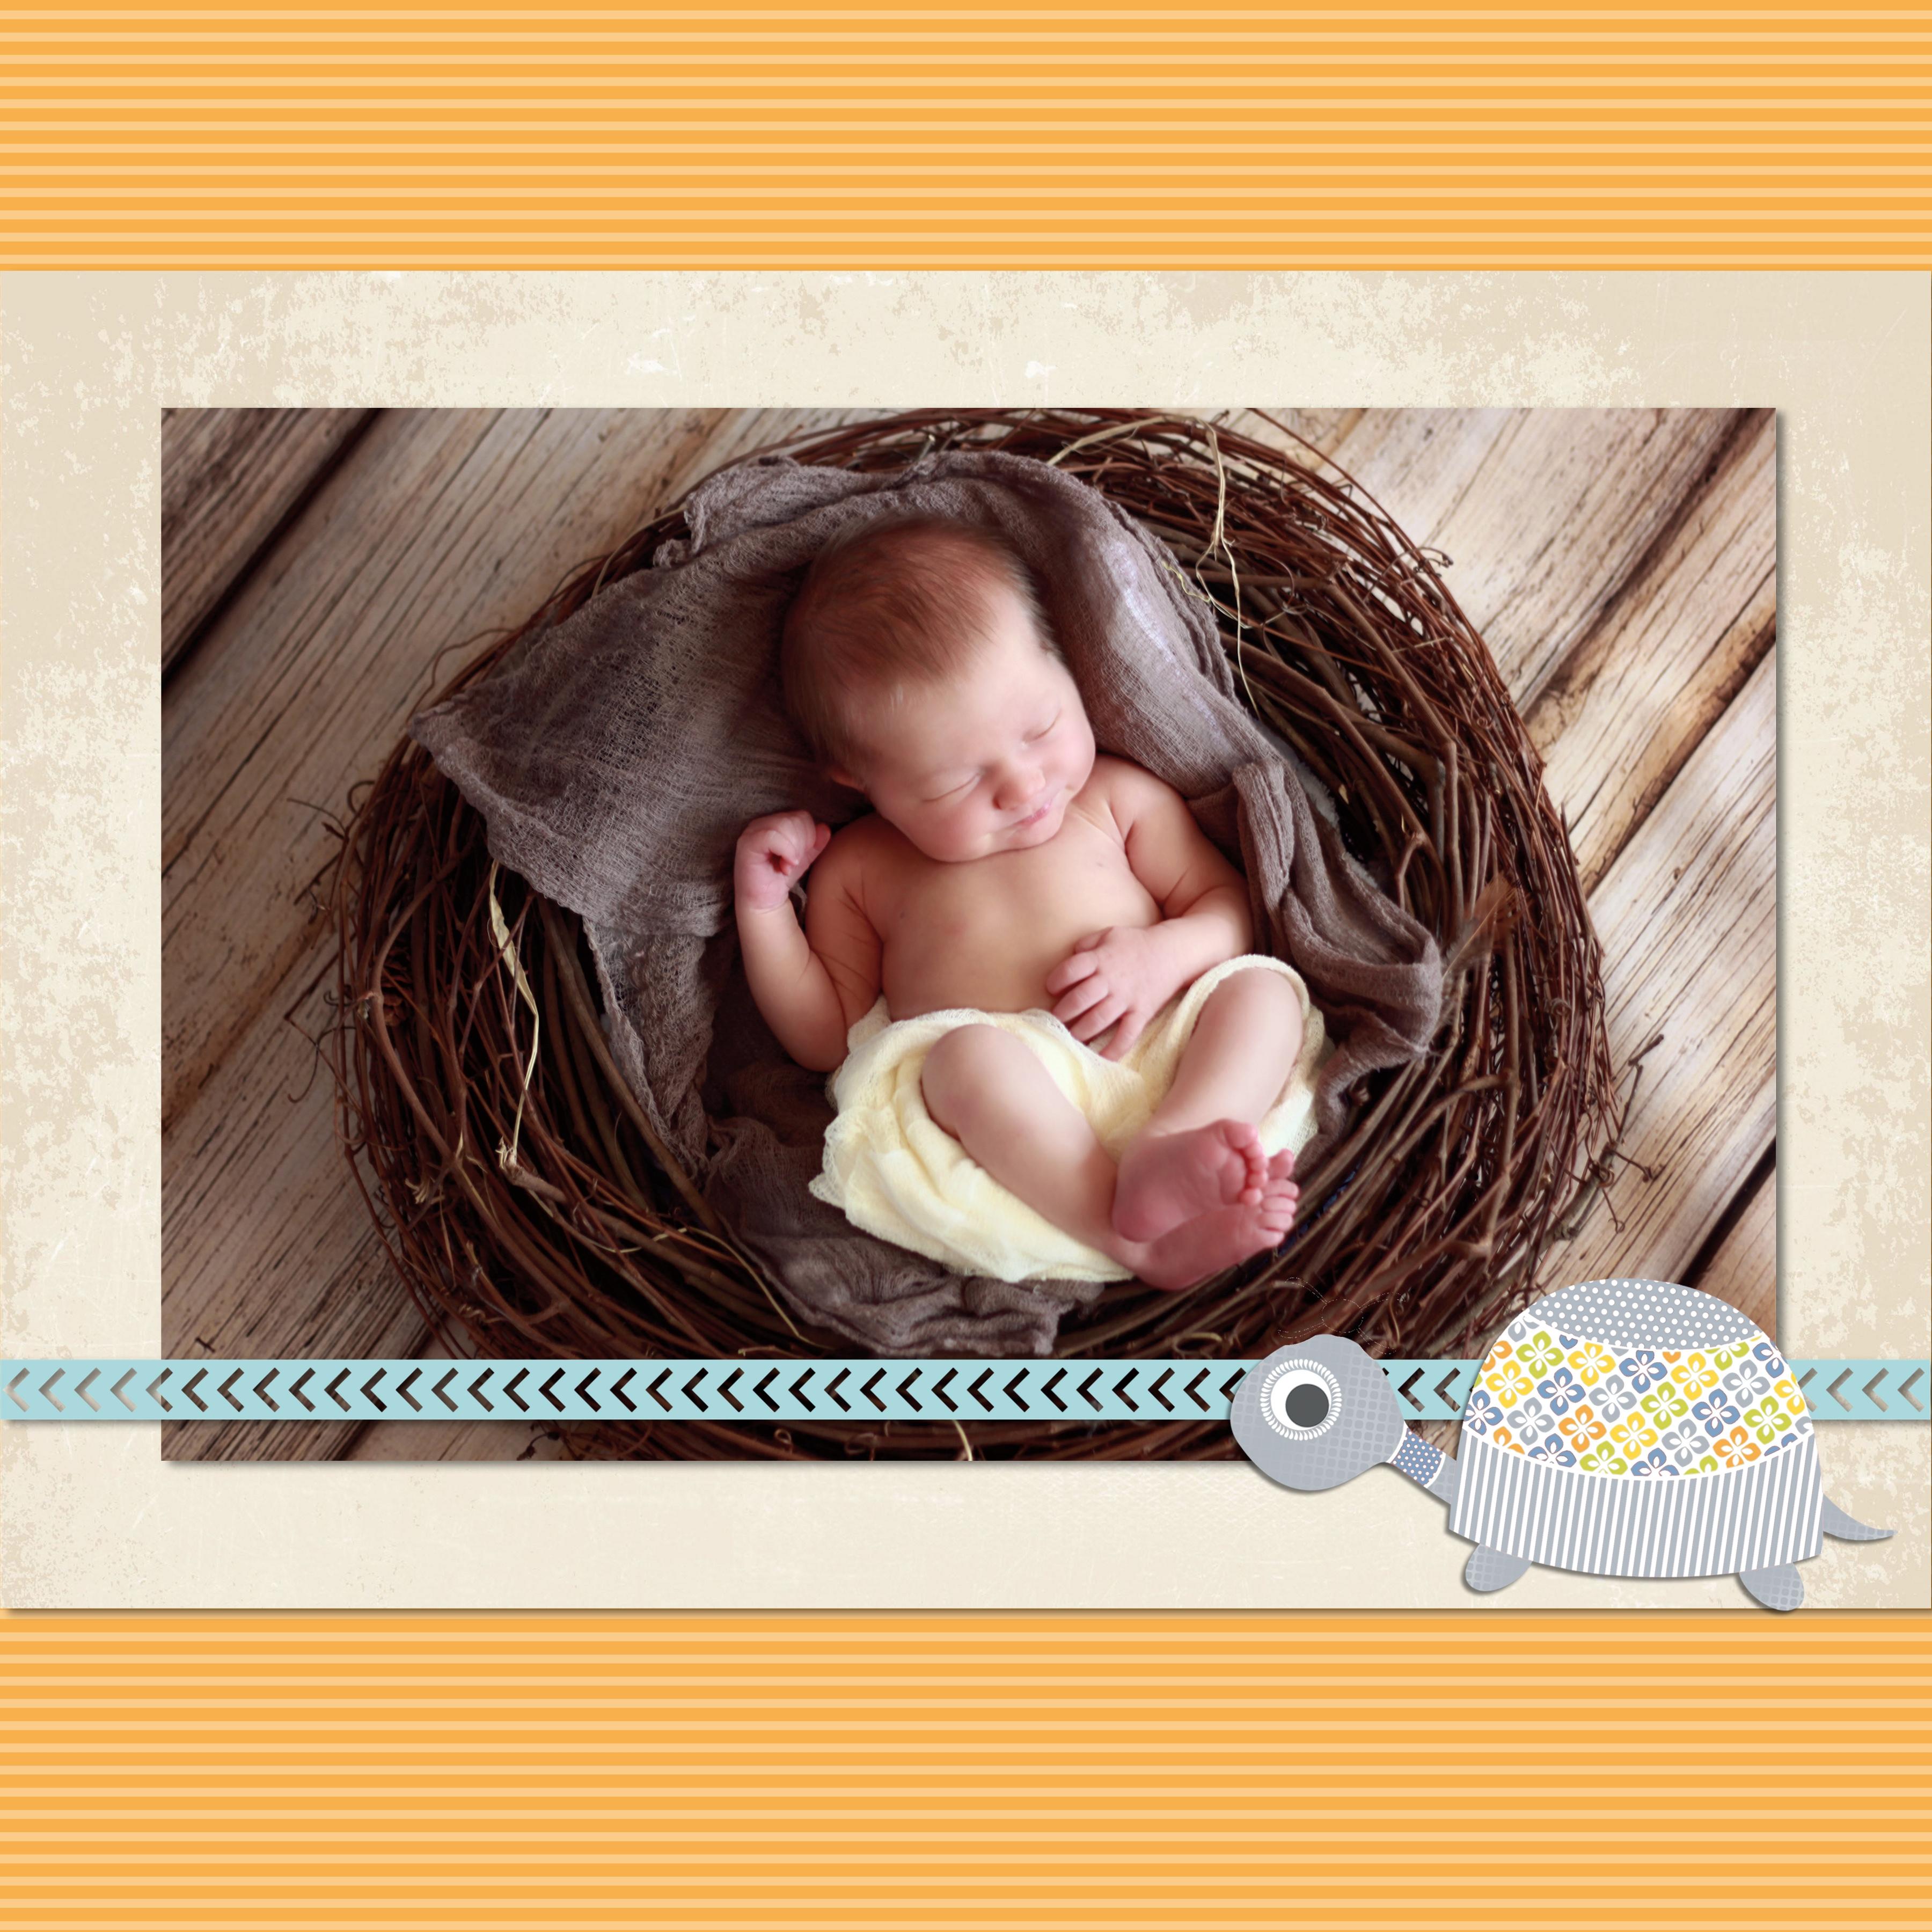 BabyBoy - Page 005.jpg